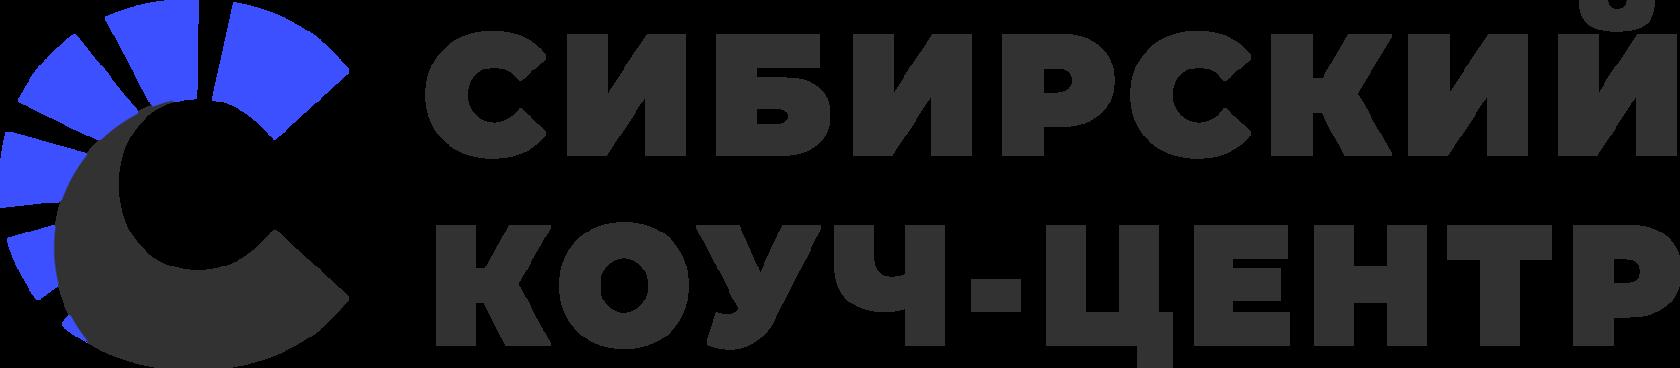 Сибирский коуч-центр